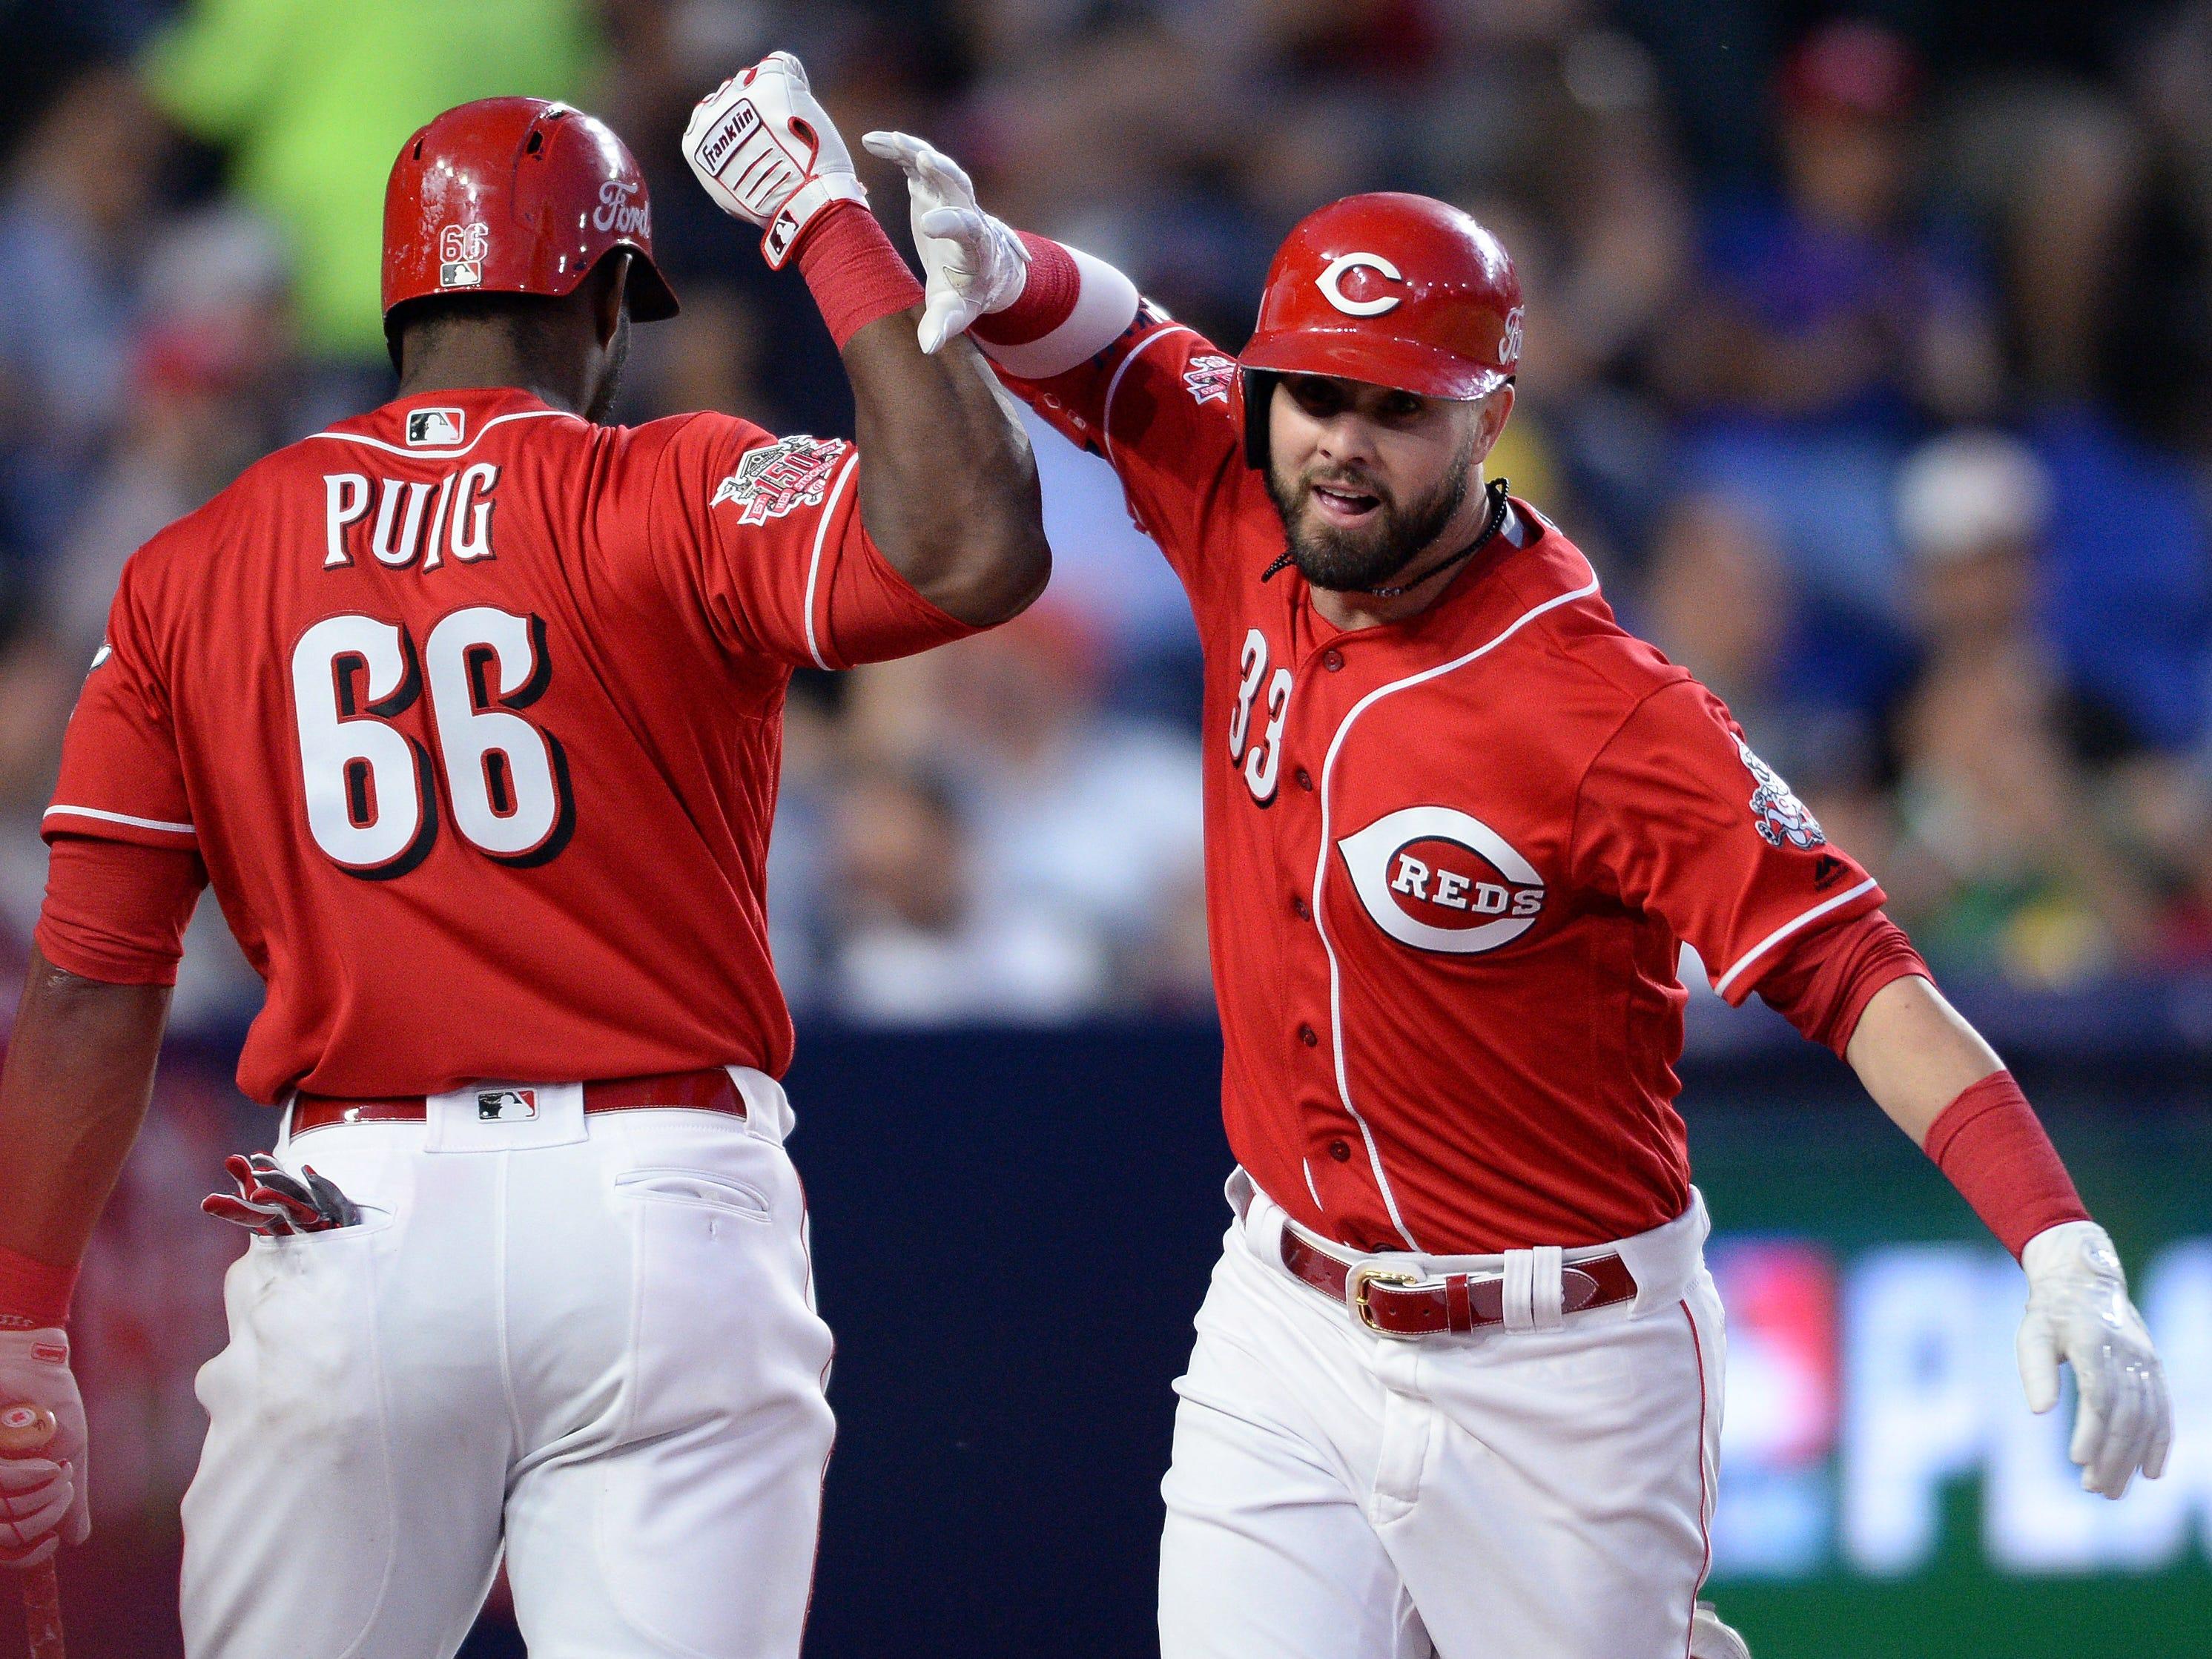 Cincinnati Reds left fielder Jesse Winker (33) is congratulated by right fielder Yasiel Puig (66) after hitting a home run during the sixth inning at Estadio de Beisbol Monterrey.